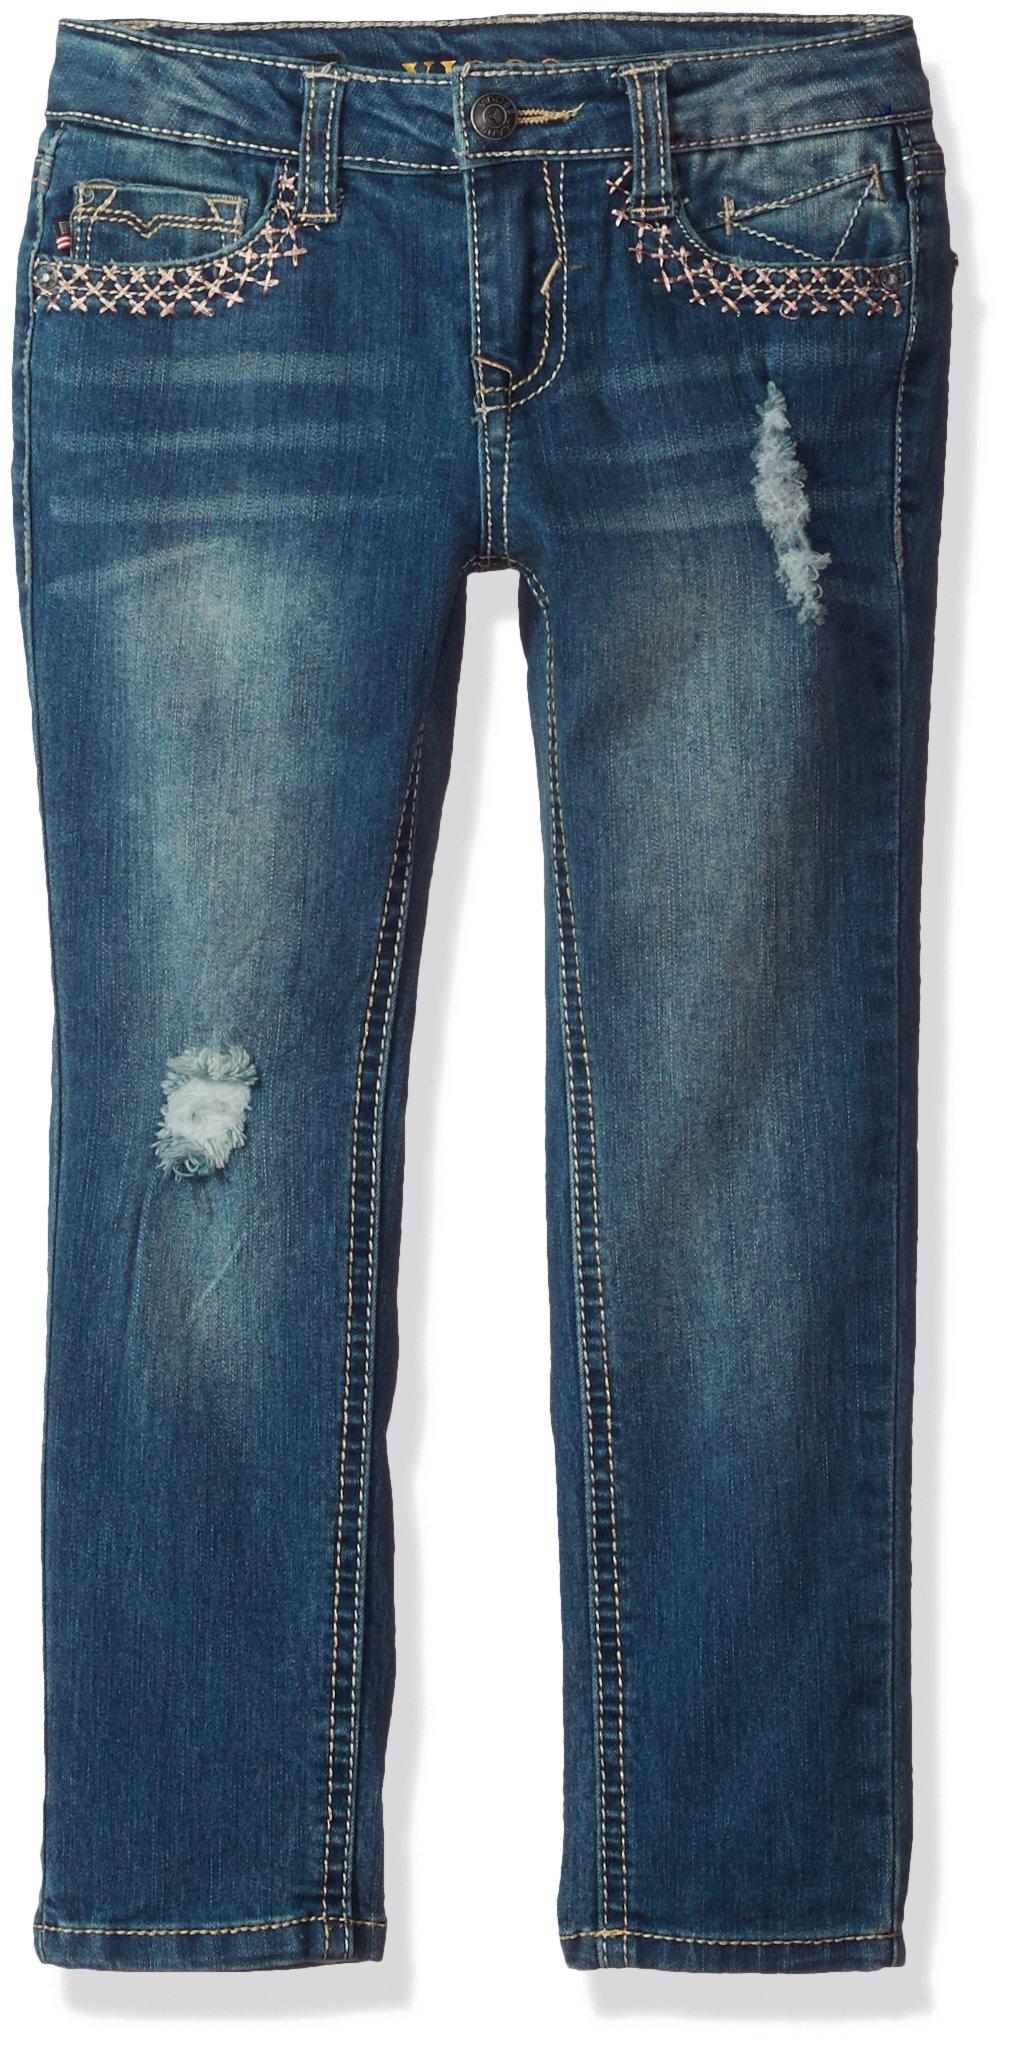 VIGOSS Girls' Big Back Pocket Jean, City Blue, 10